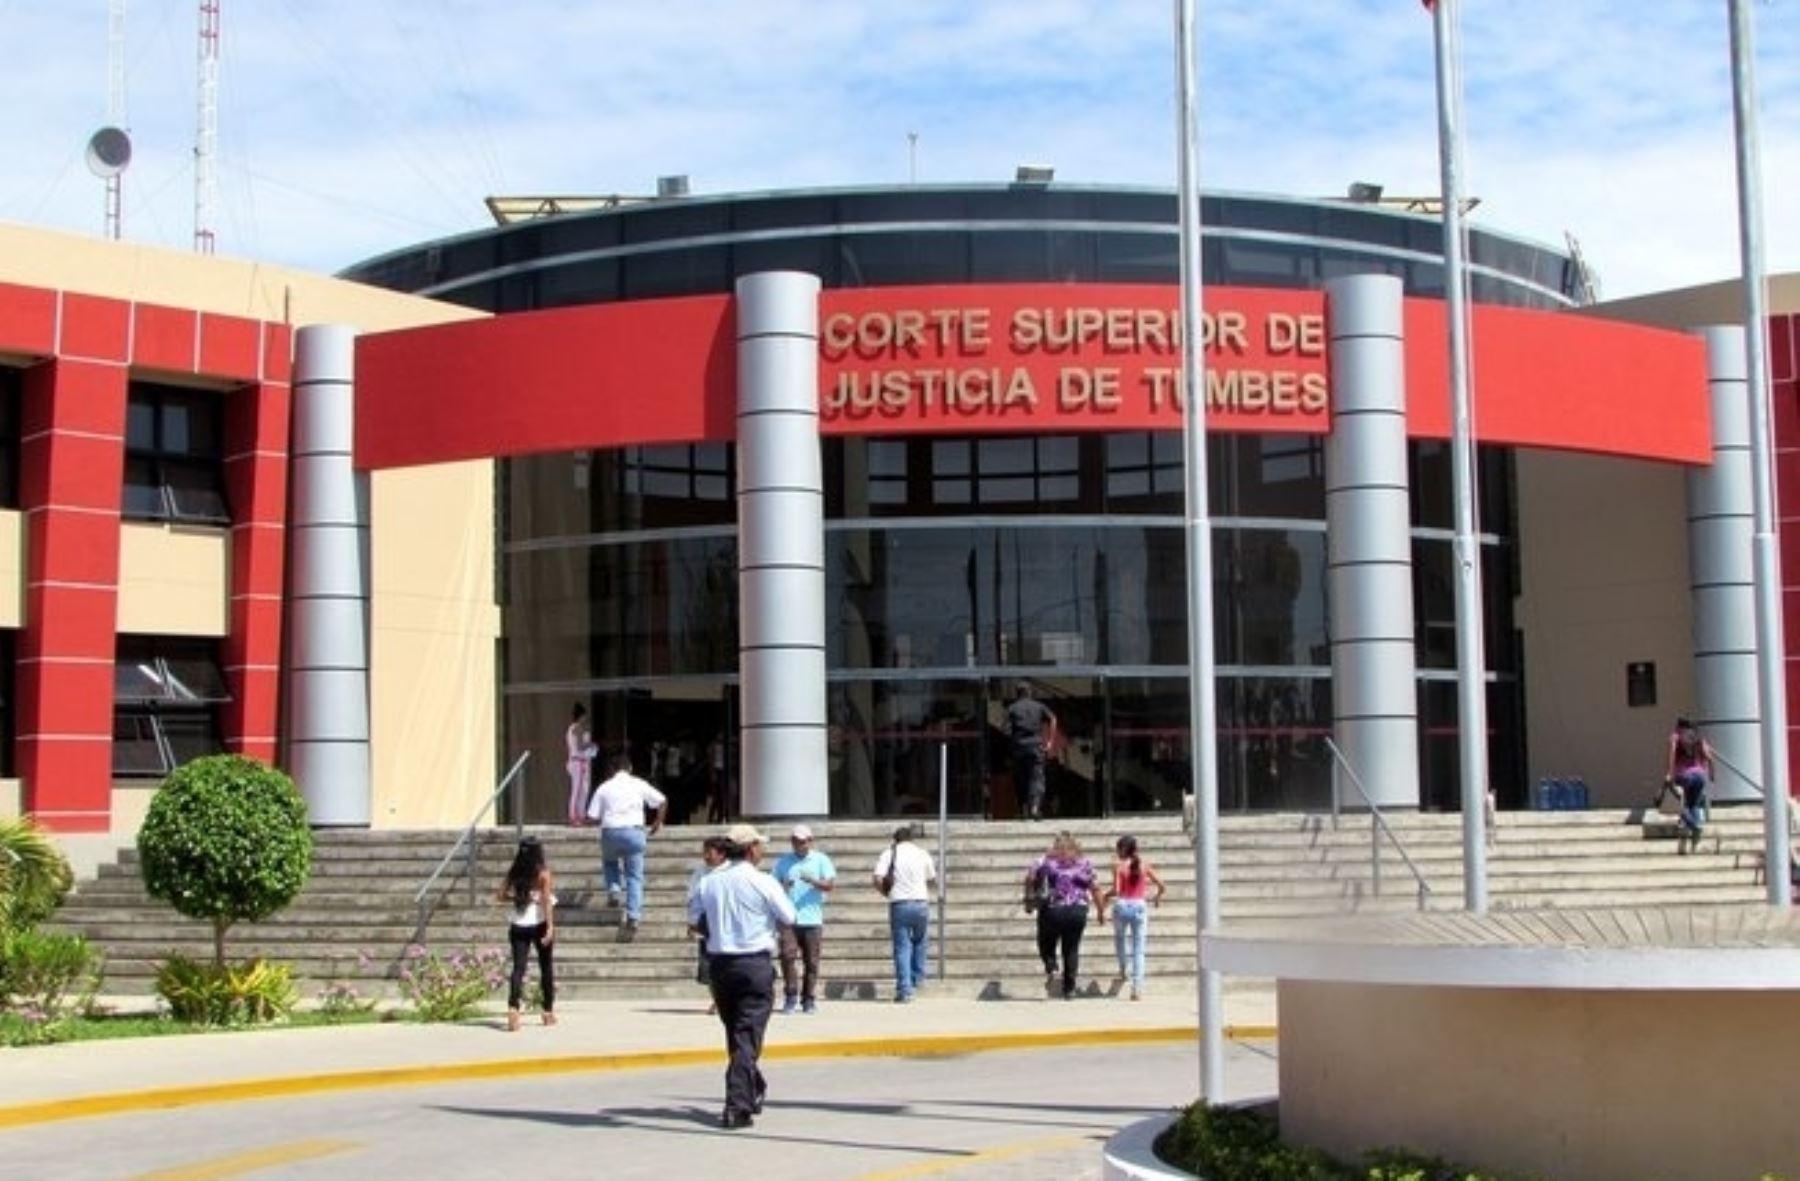 Corte Superior de Justicia de Tumbes. ANDINA/Difusión